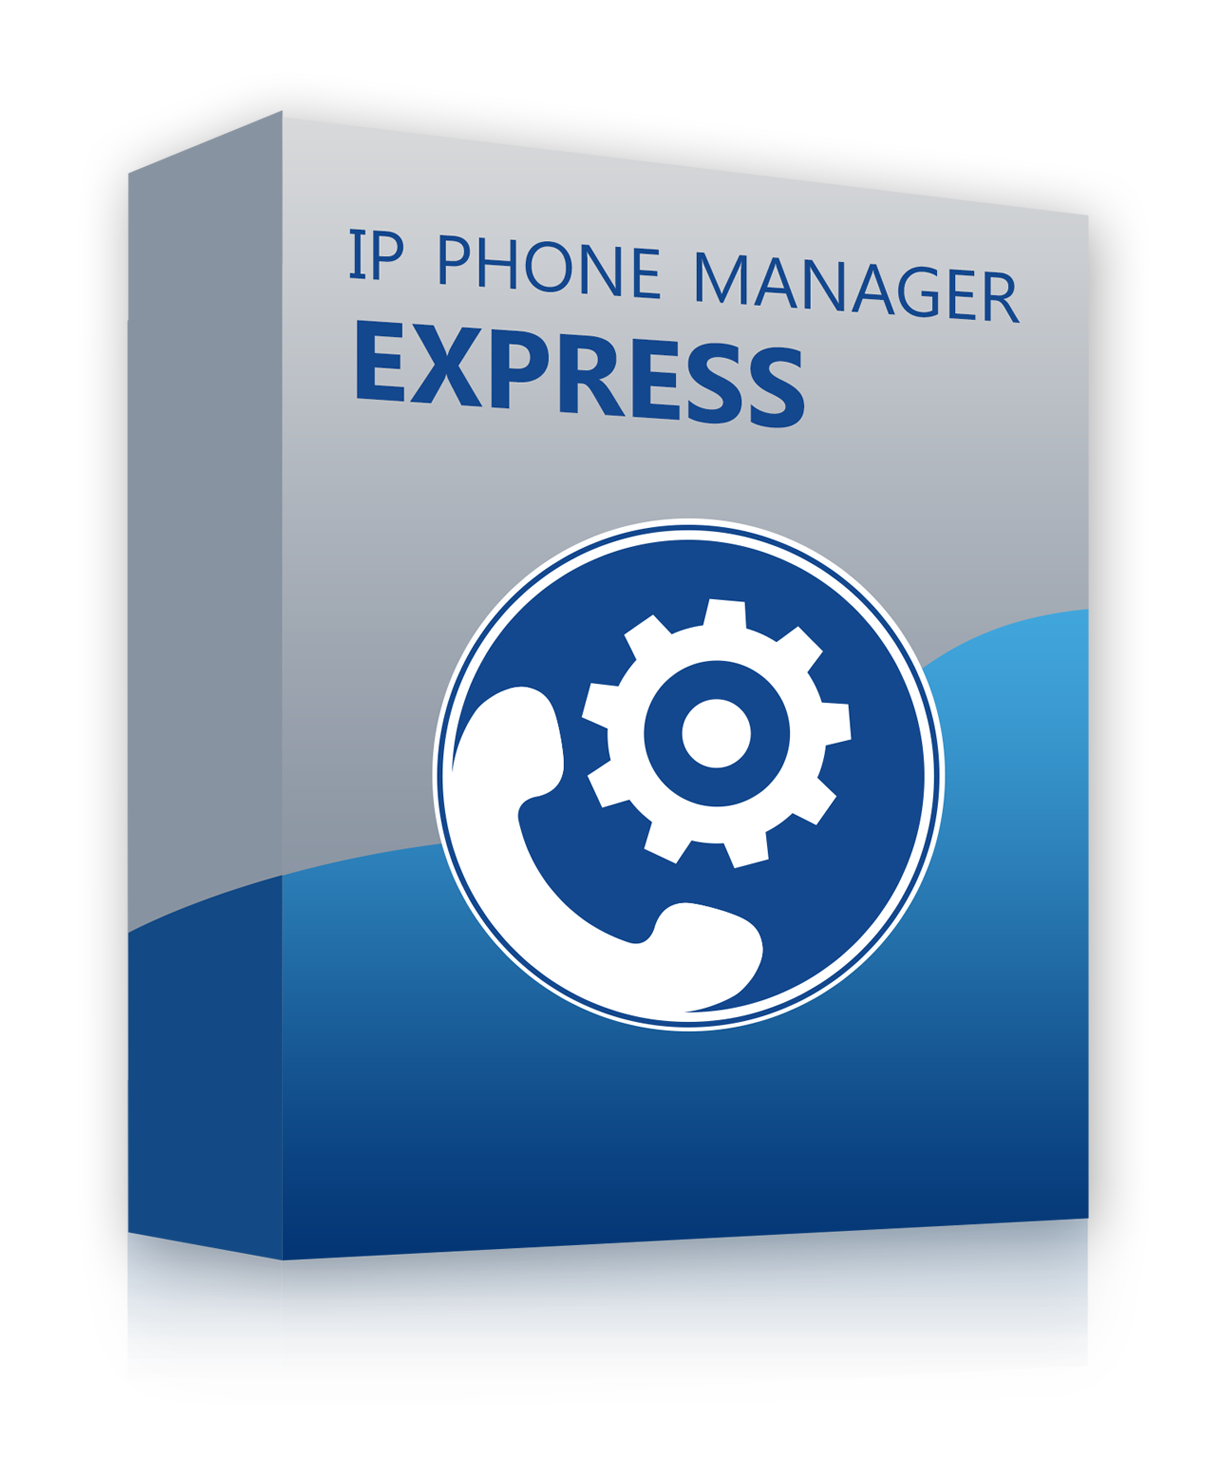 IP Phone Manager Express